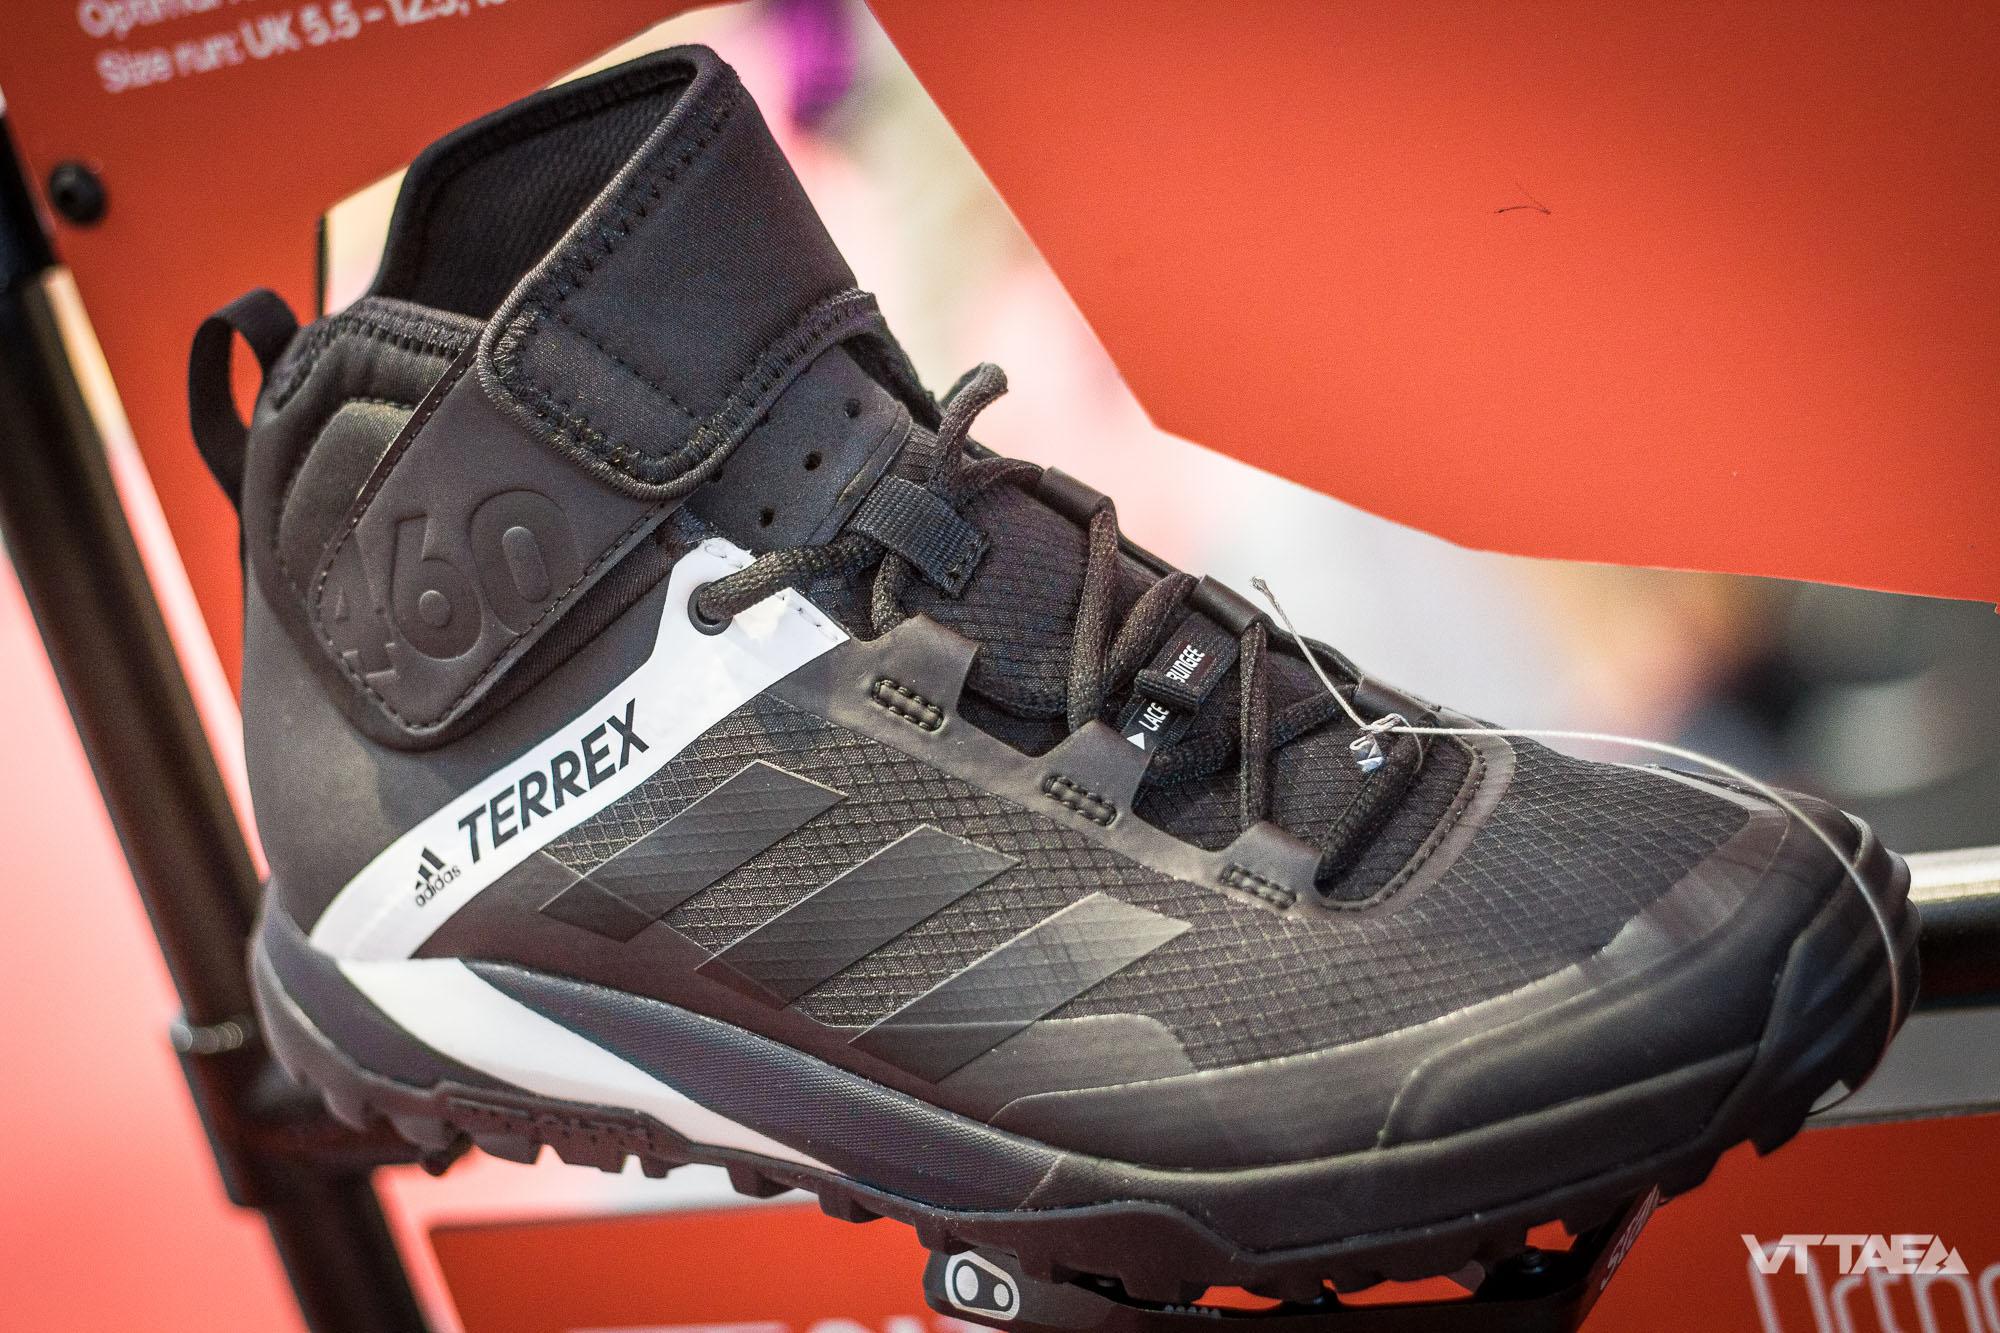 vttae-adidas-terrex-7